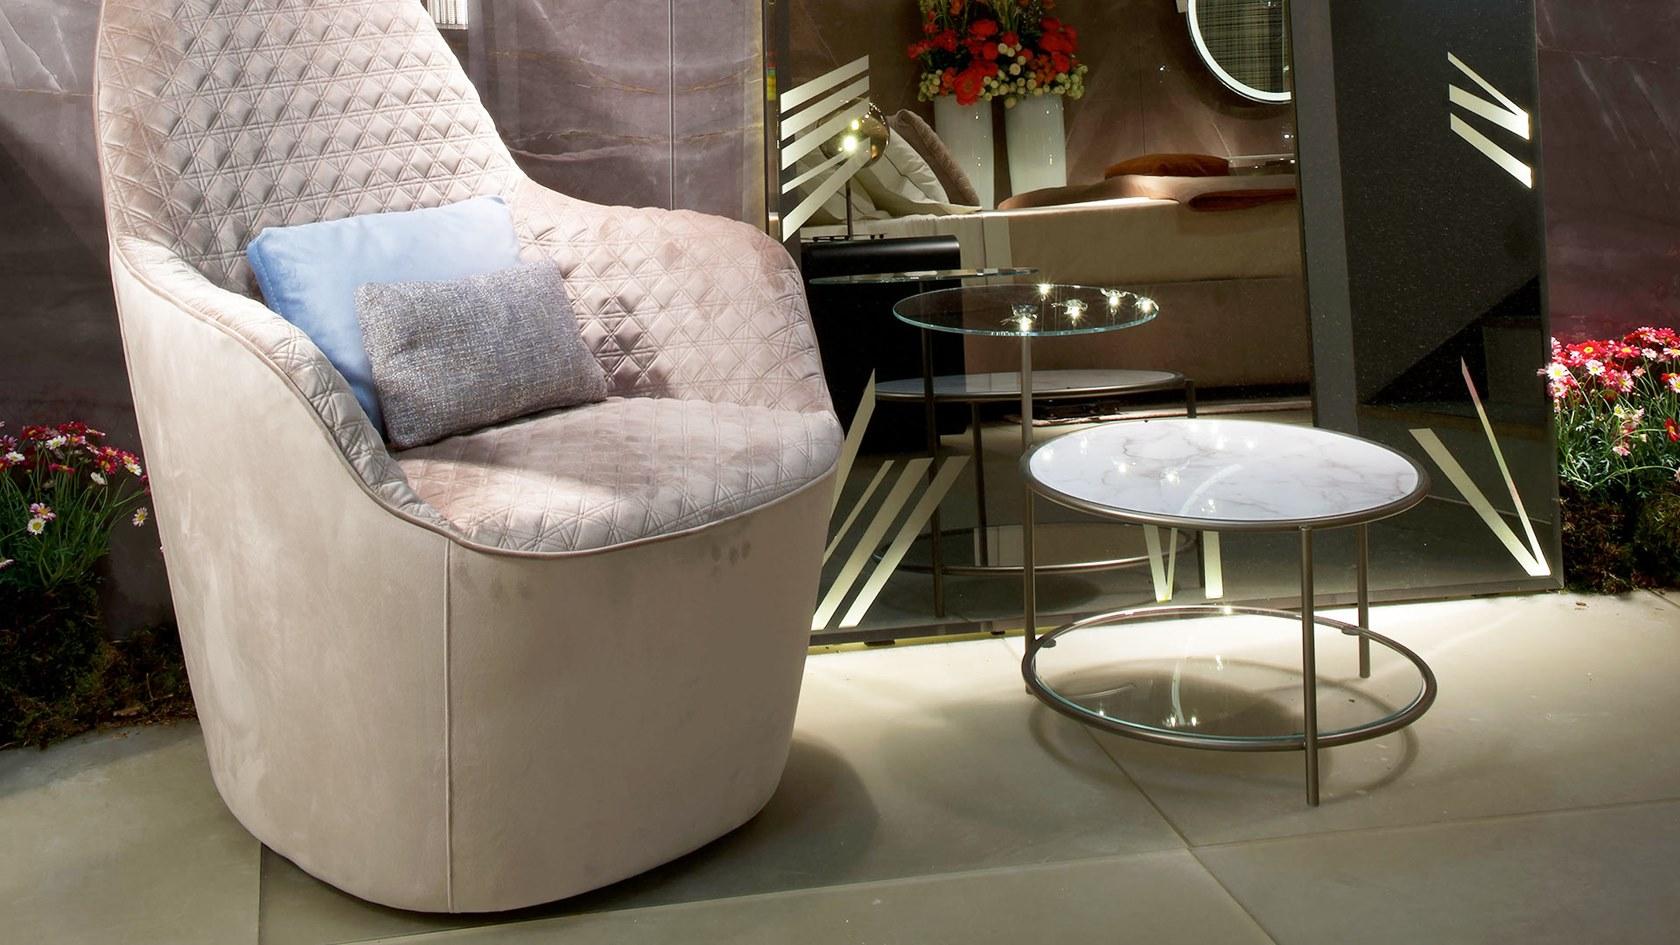 意大利设计师 Reflex  EGEO Tea table  Gianmarco Codato, Luciano Trevisiol  埃戈茶几不锈钢无指纹技术钢化玻璃